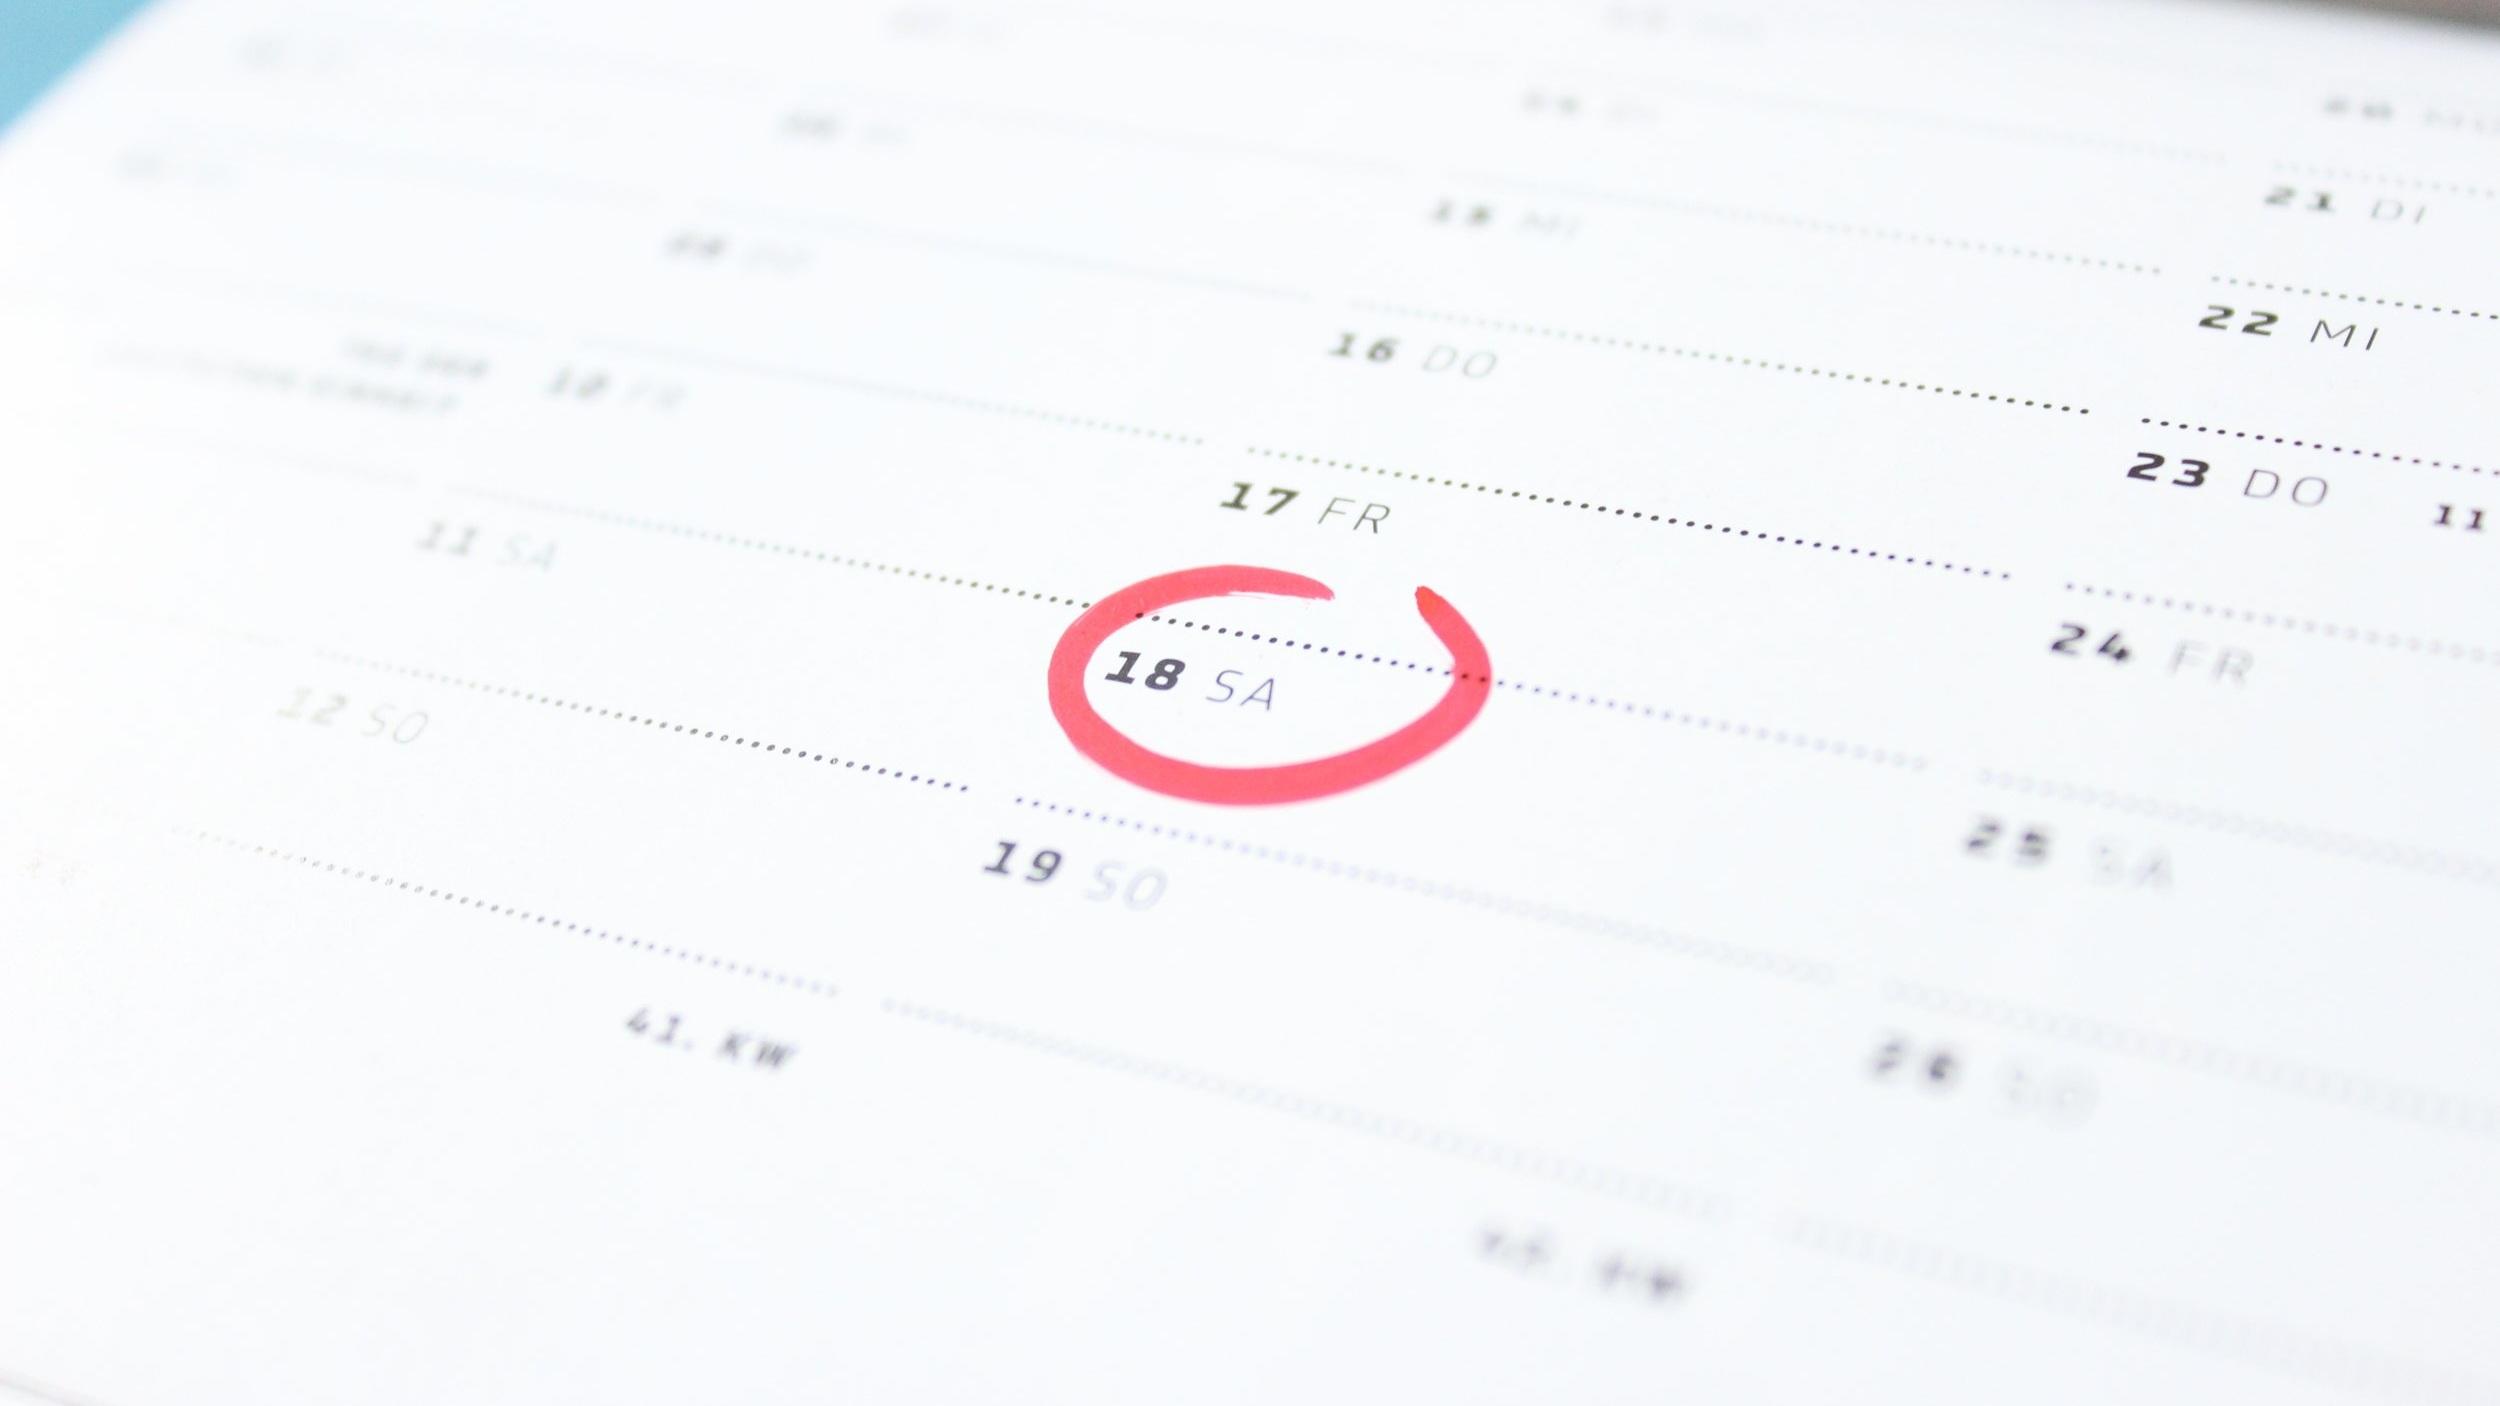 writing-time-range-line-date-brand-985713-pxhere.com.jpg